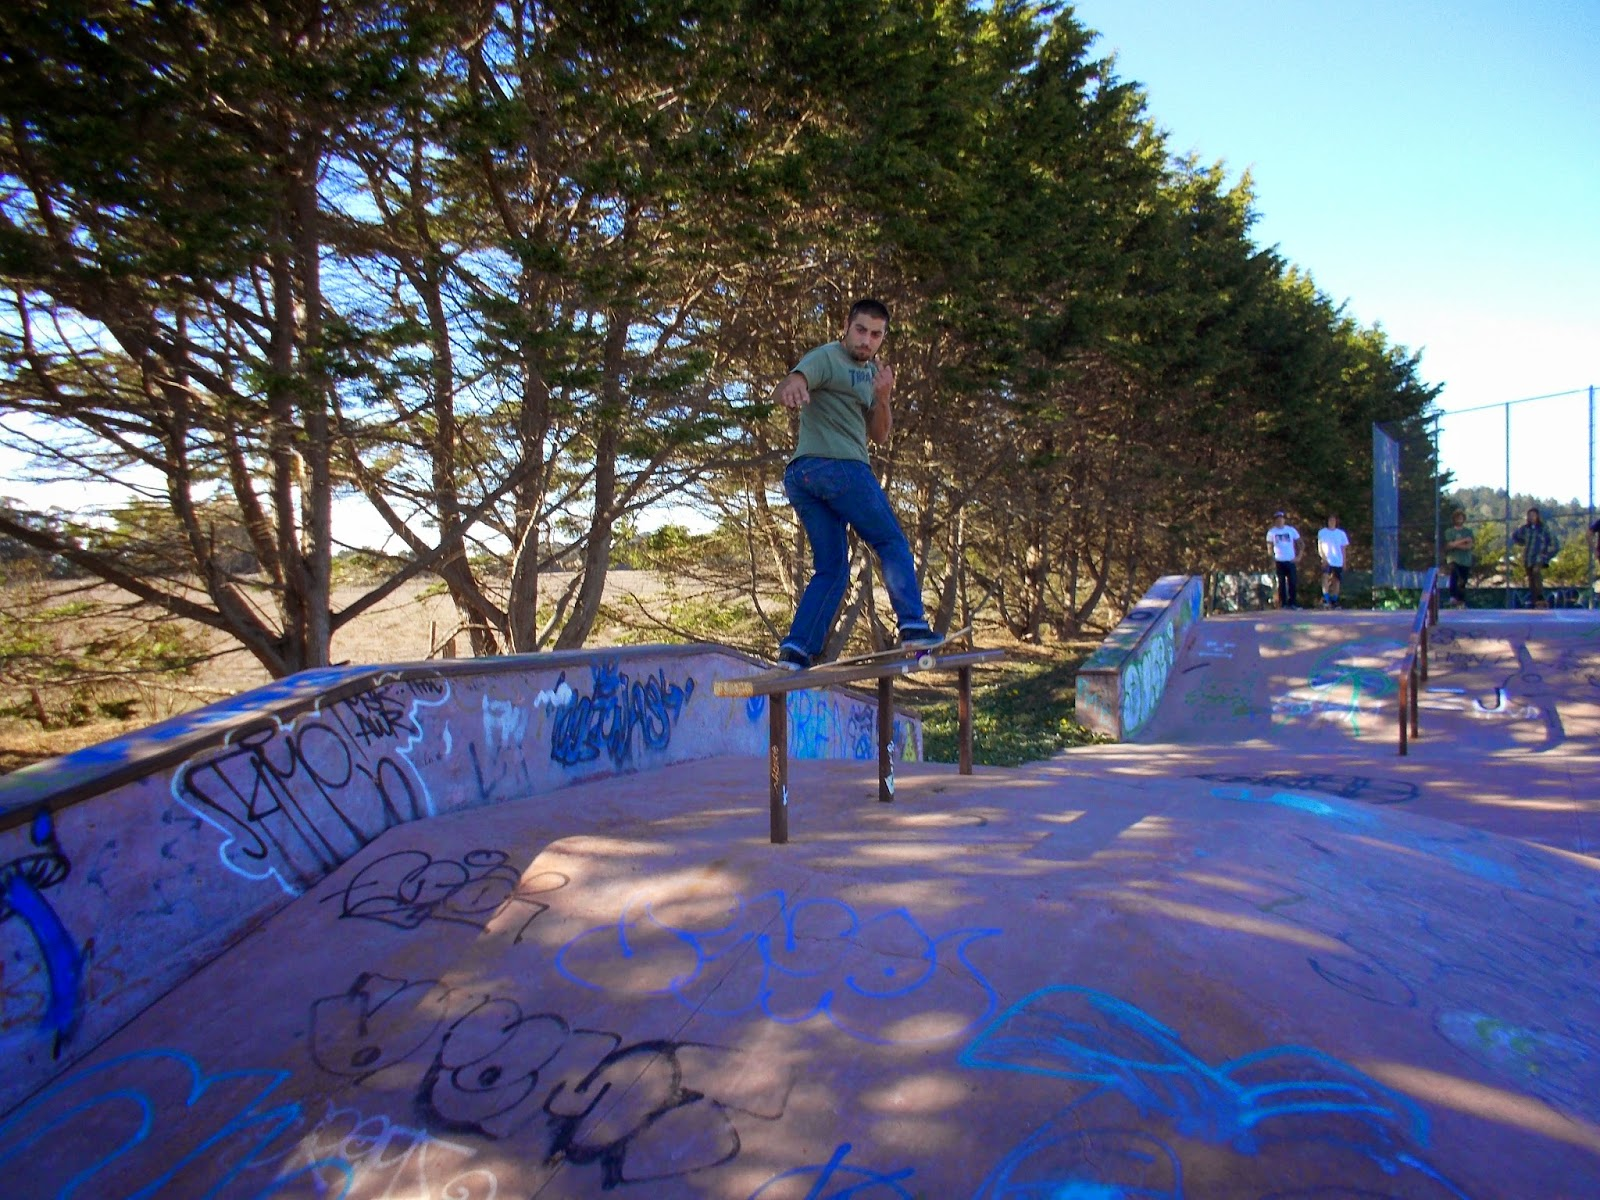 mesa skatepark, bolinas, california